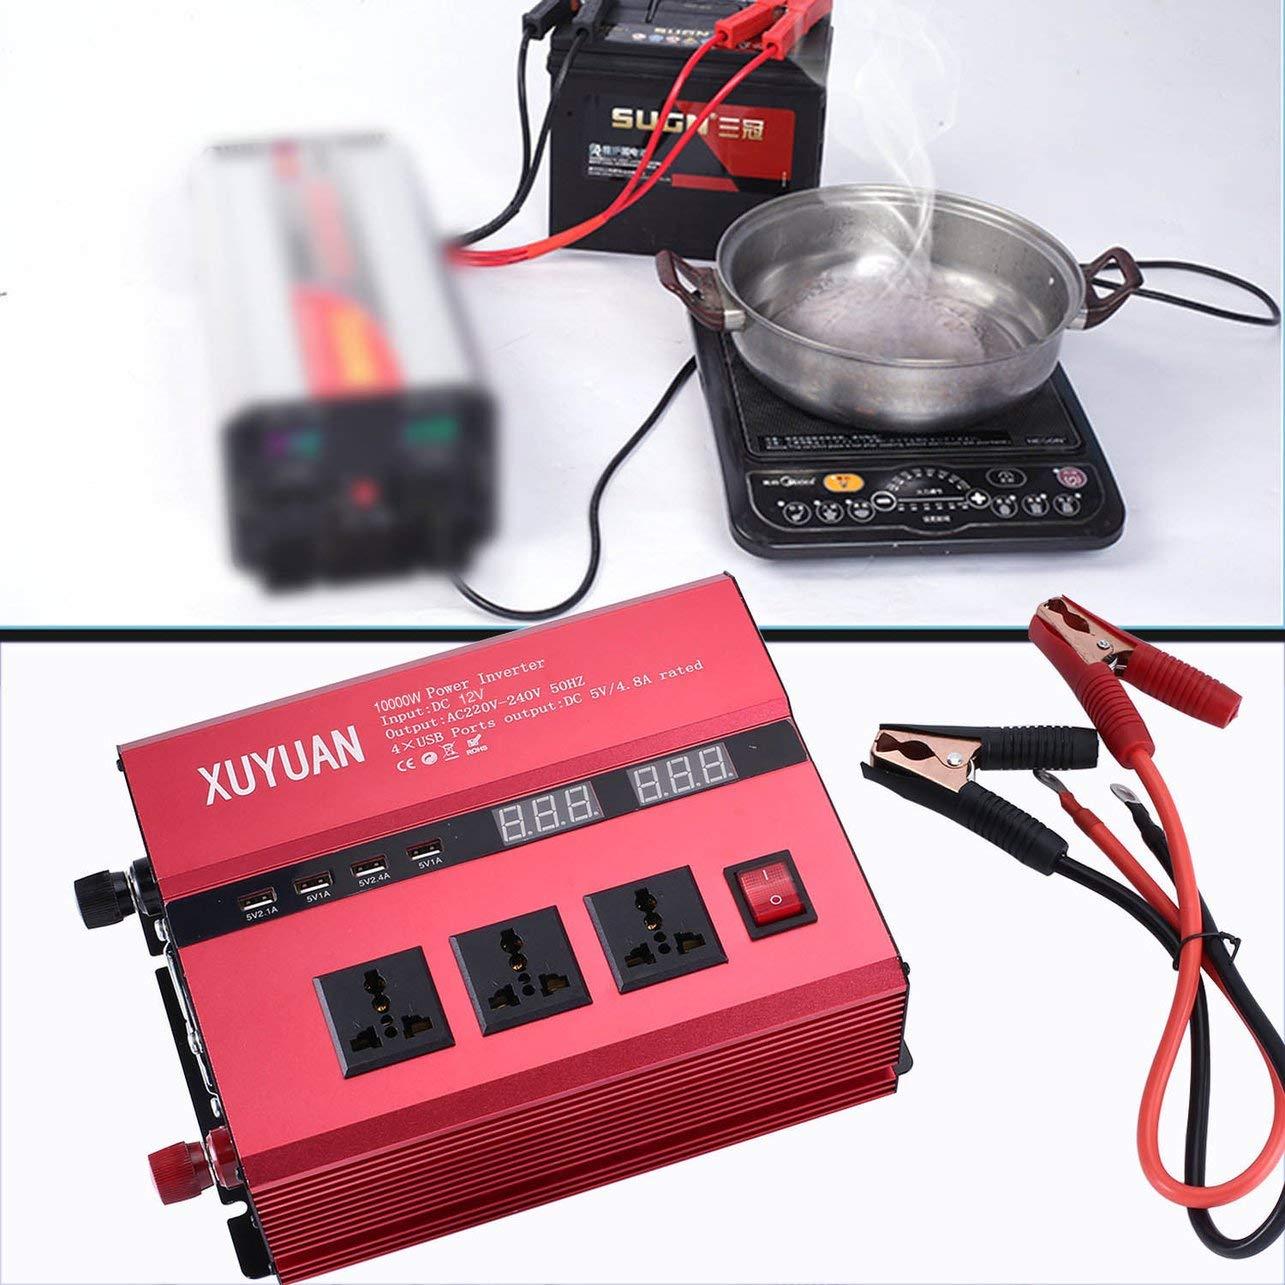 anzeigen 10000W Sonnenenergie-Inverter USB-LED AC//DC Sinus-Konverter rot